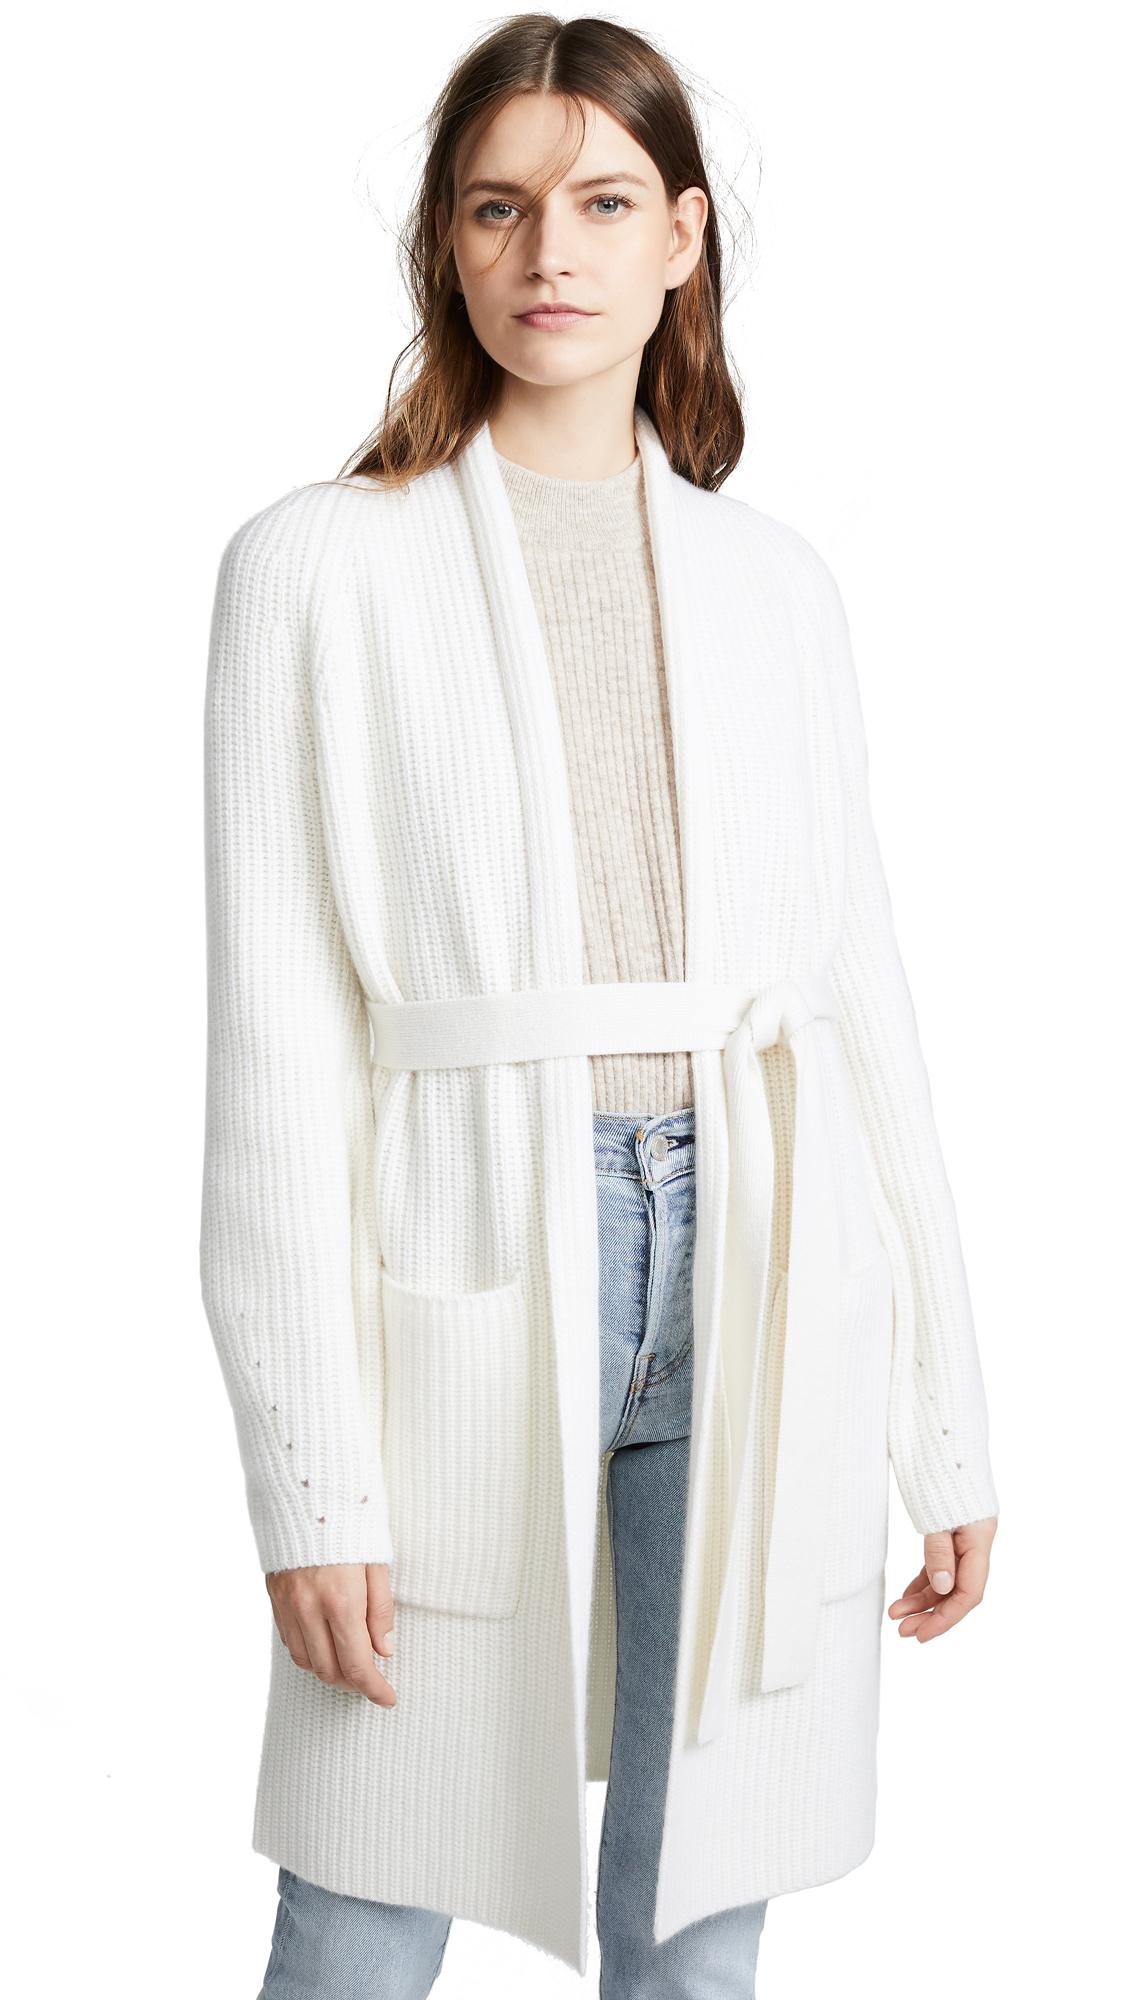 TSE CASHMERE Cashmere Cardigan Coat in Creme